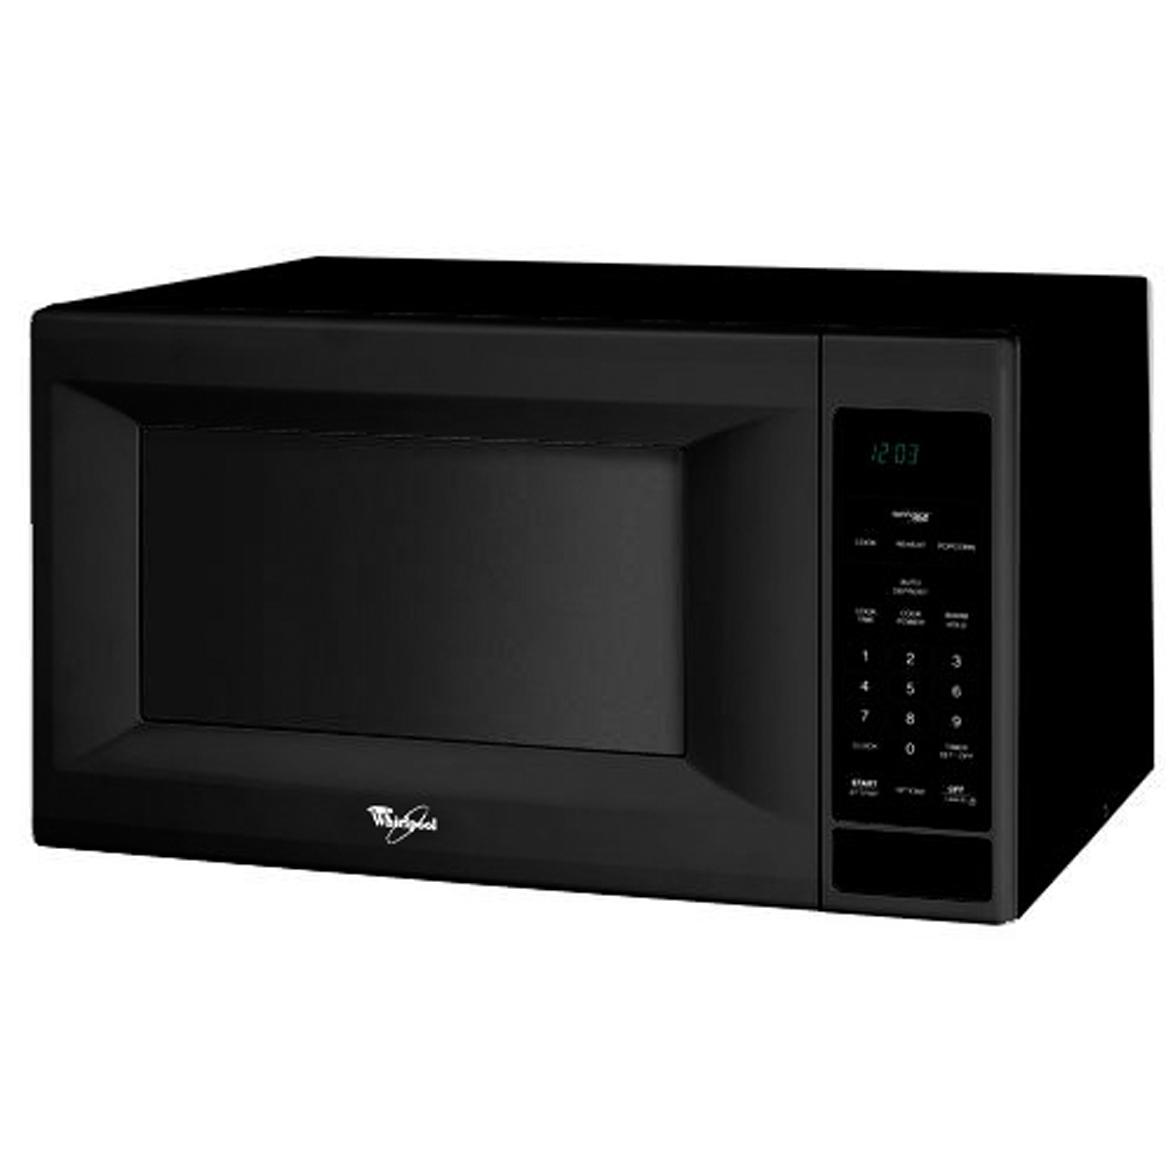 Microwave Ovens Countertop ~ Mt spb whirlpool countertop microwaves black